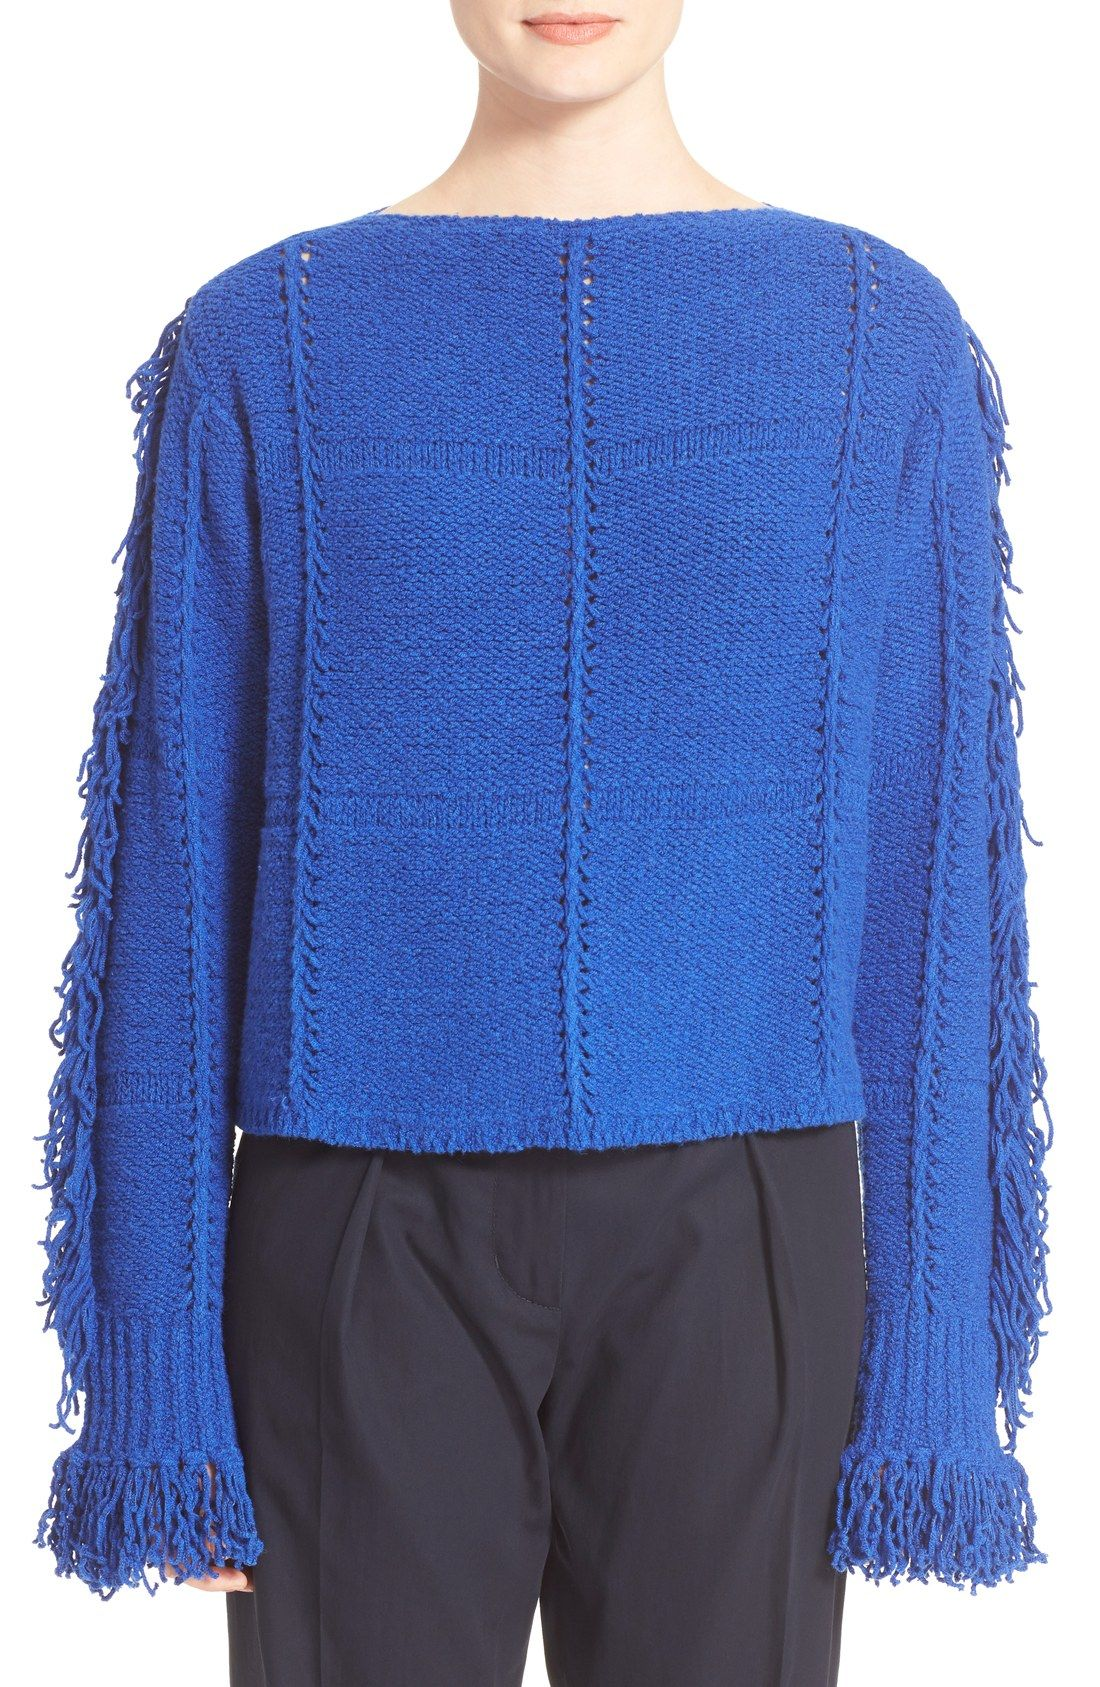 3.1 Phillip Lim Fringed Crop Sweater